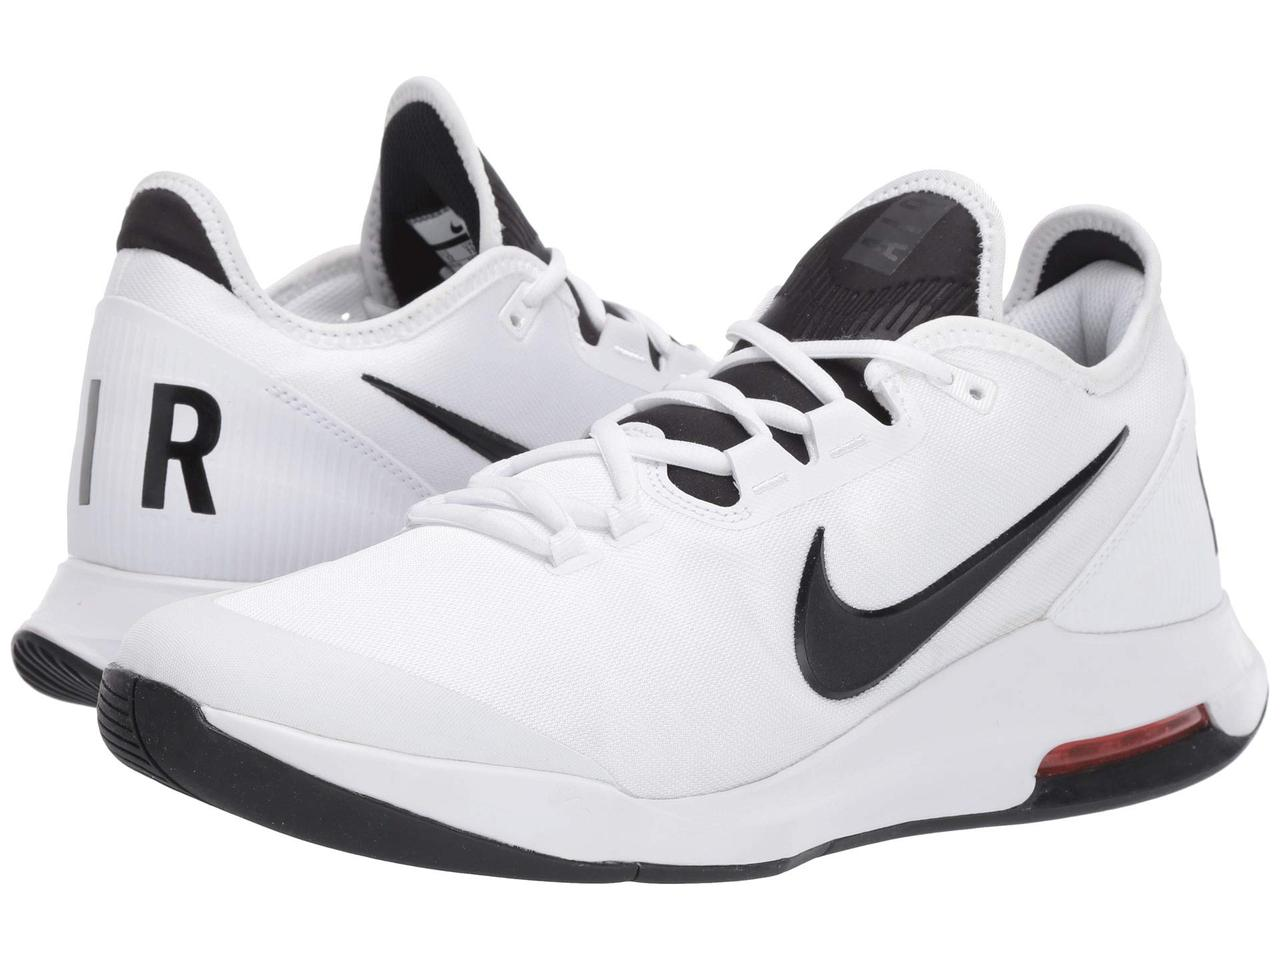 2004409d Кроссовки/Кеды (Оригинал) Nike Air Max Wildcard White/Black/White ...